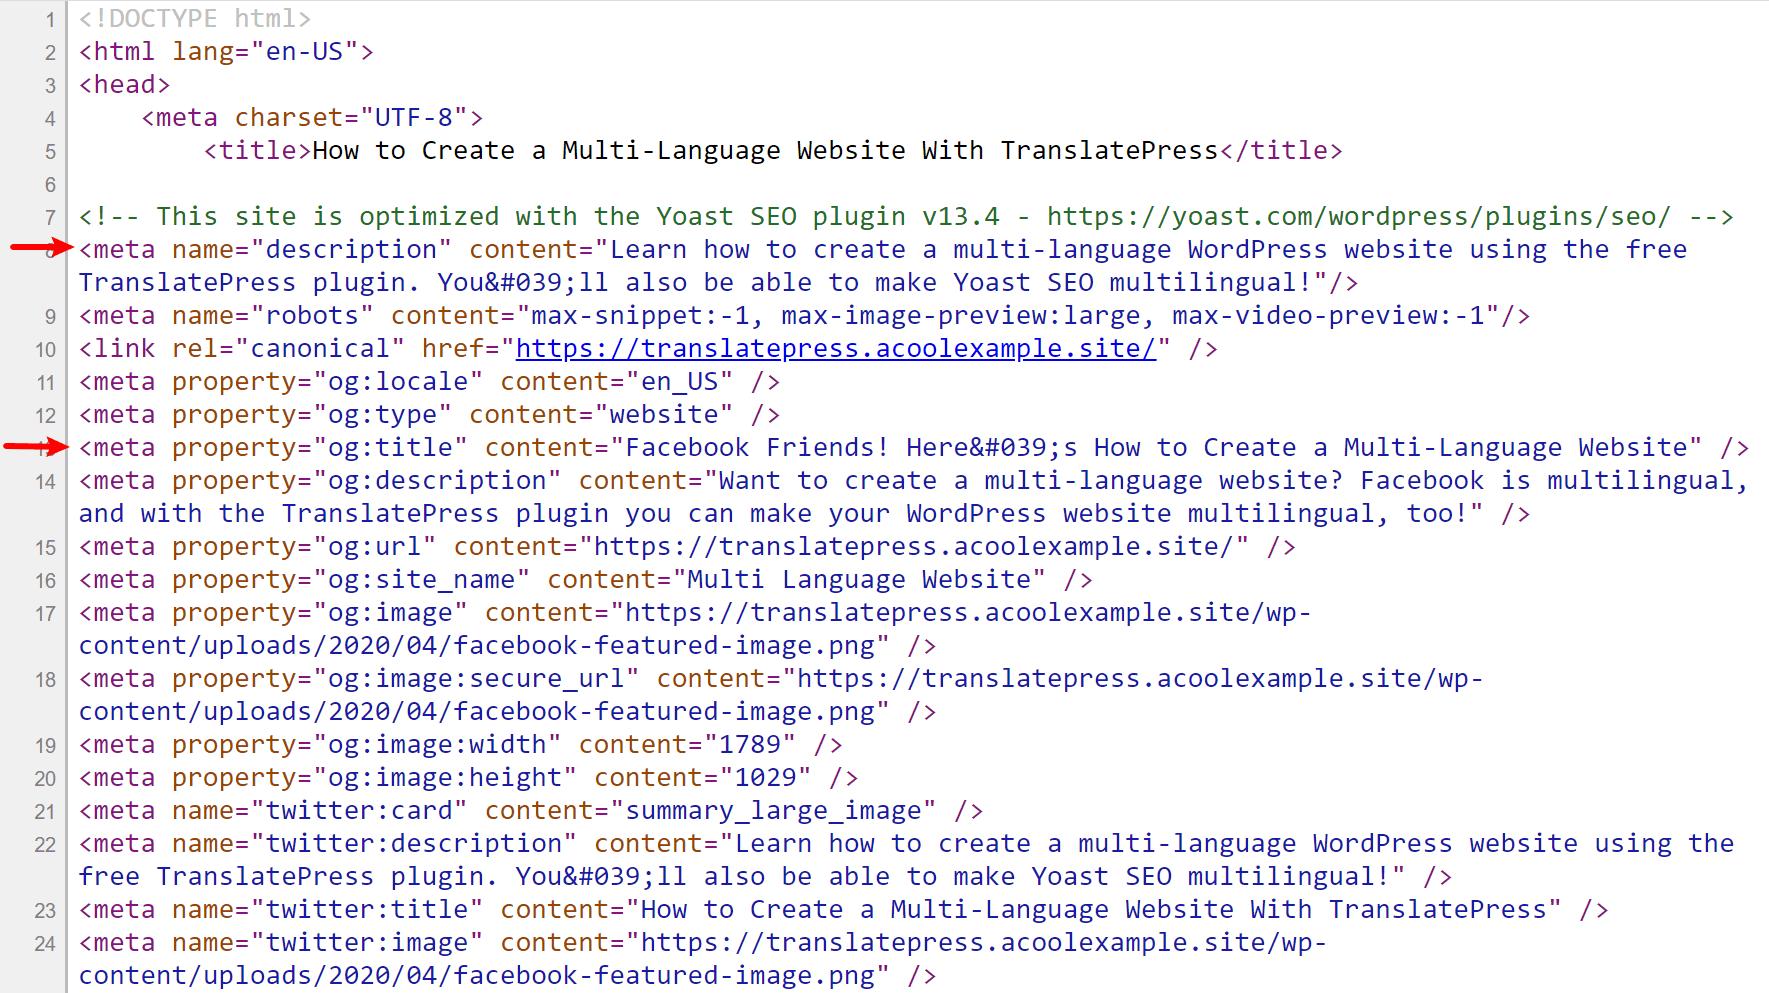 Yoast SEO metadata in native language